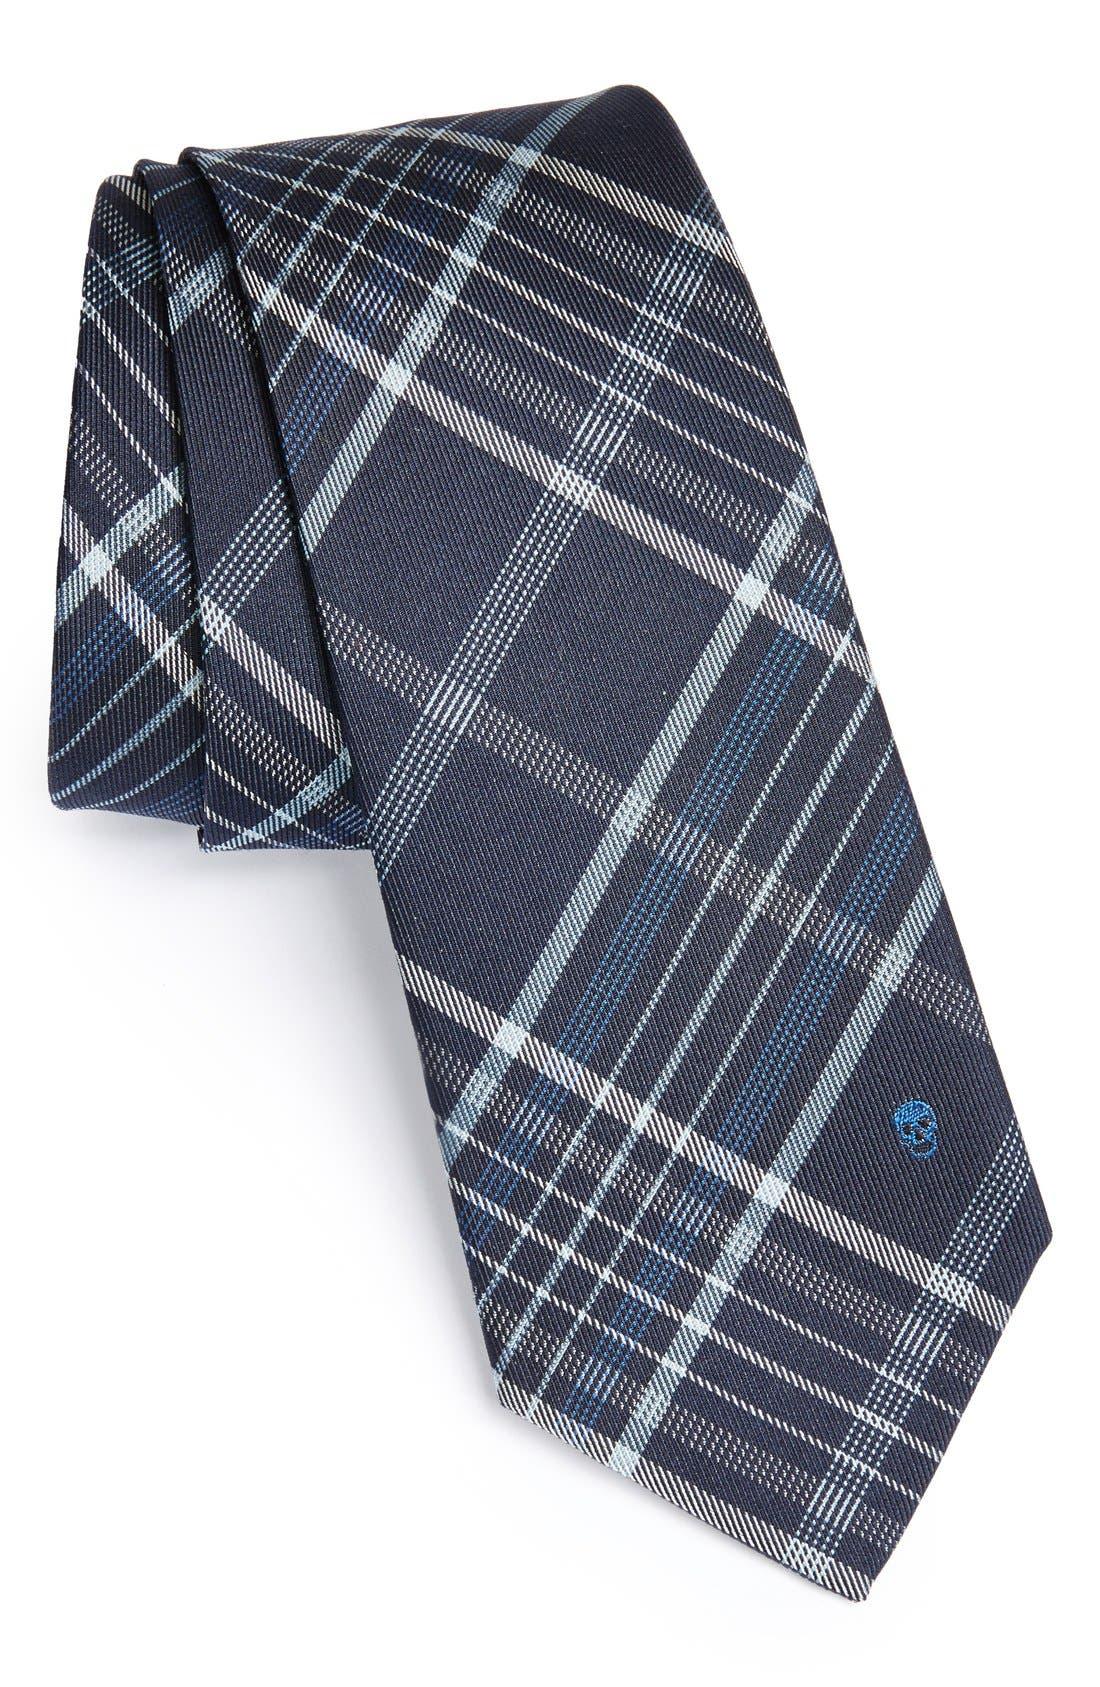 Alternate Image 1 Selected - Alexander McQueen Woven Silk & Cotton Tie